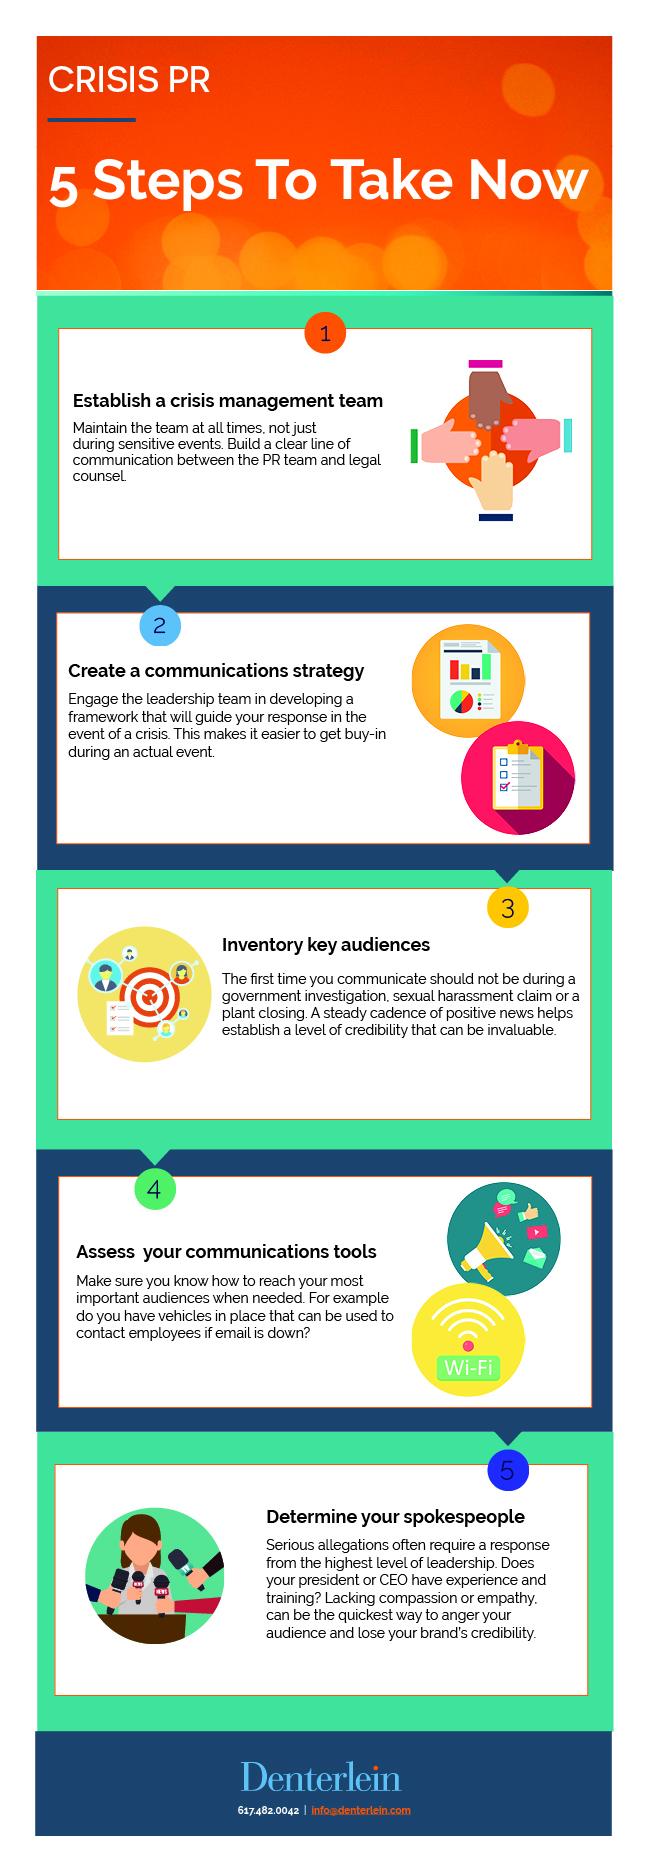 Infographic: 5 Crisis PR Steps